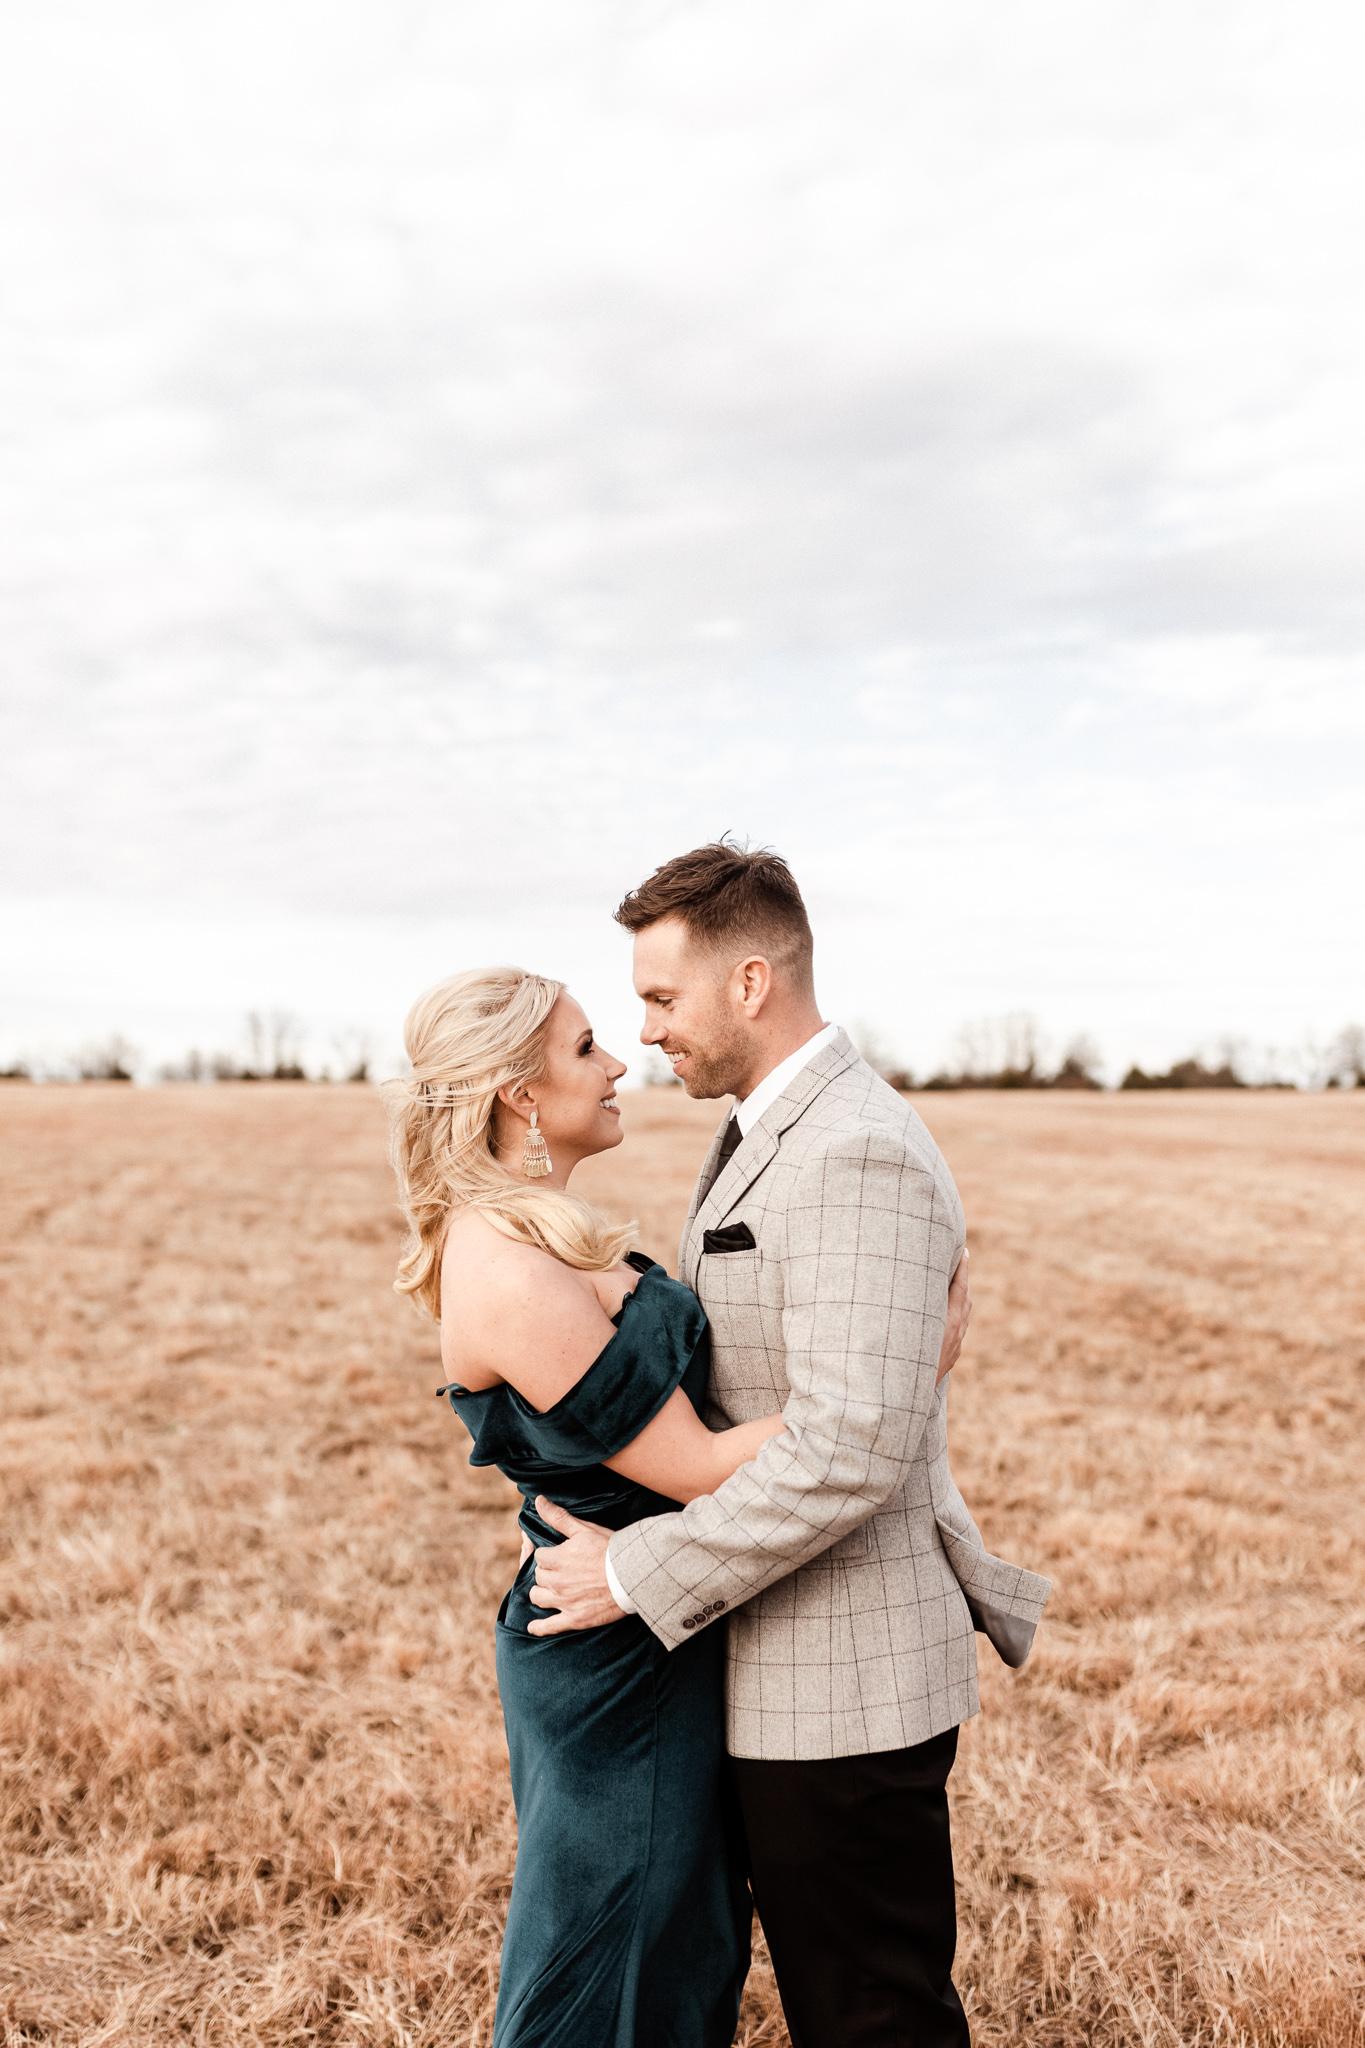 Wade + Stephanie | Warm Open Field Engagements | Oklahoma Wedding Photographer-5.jpg